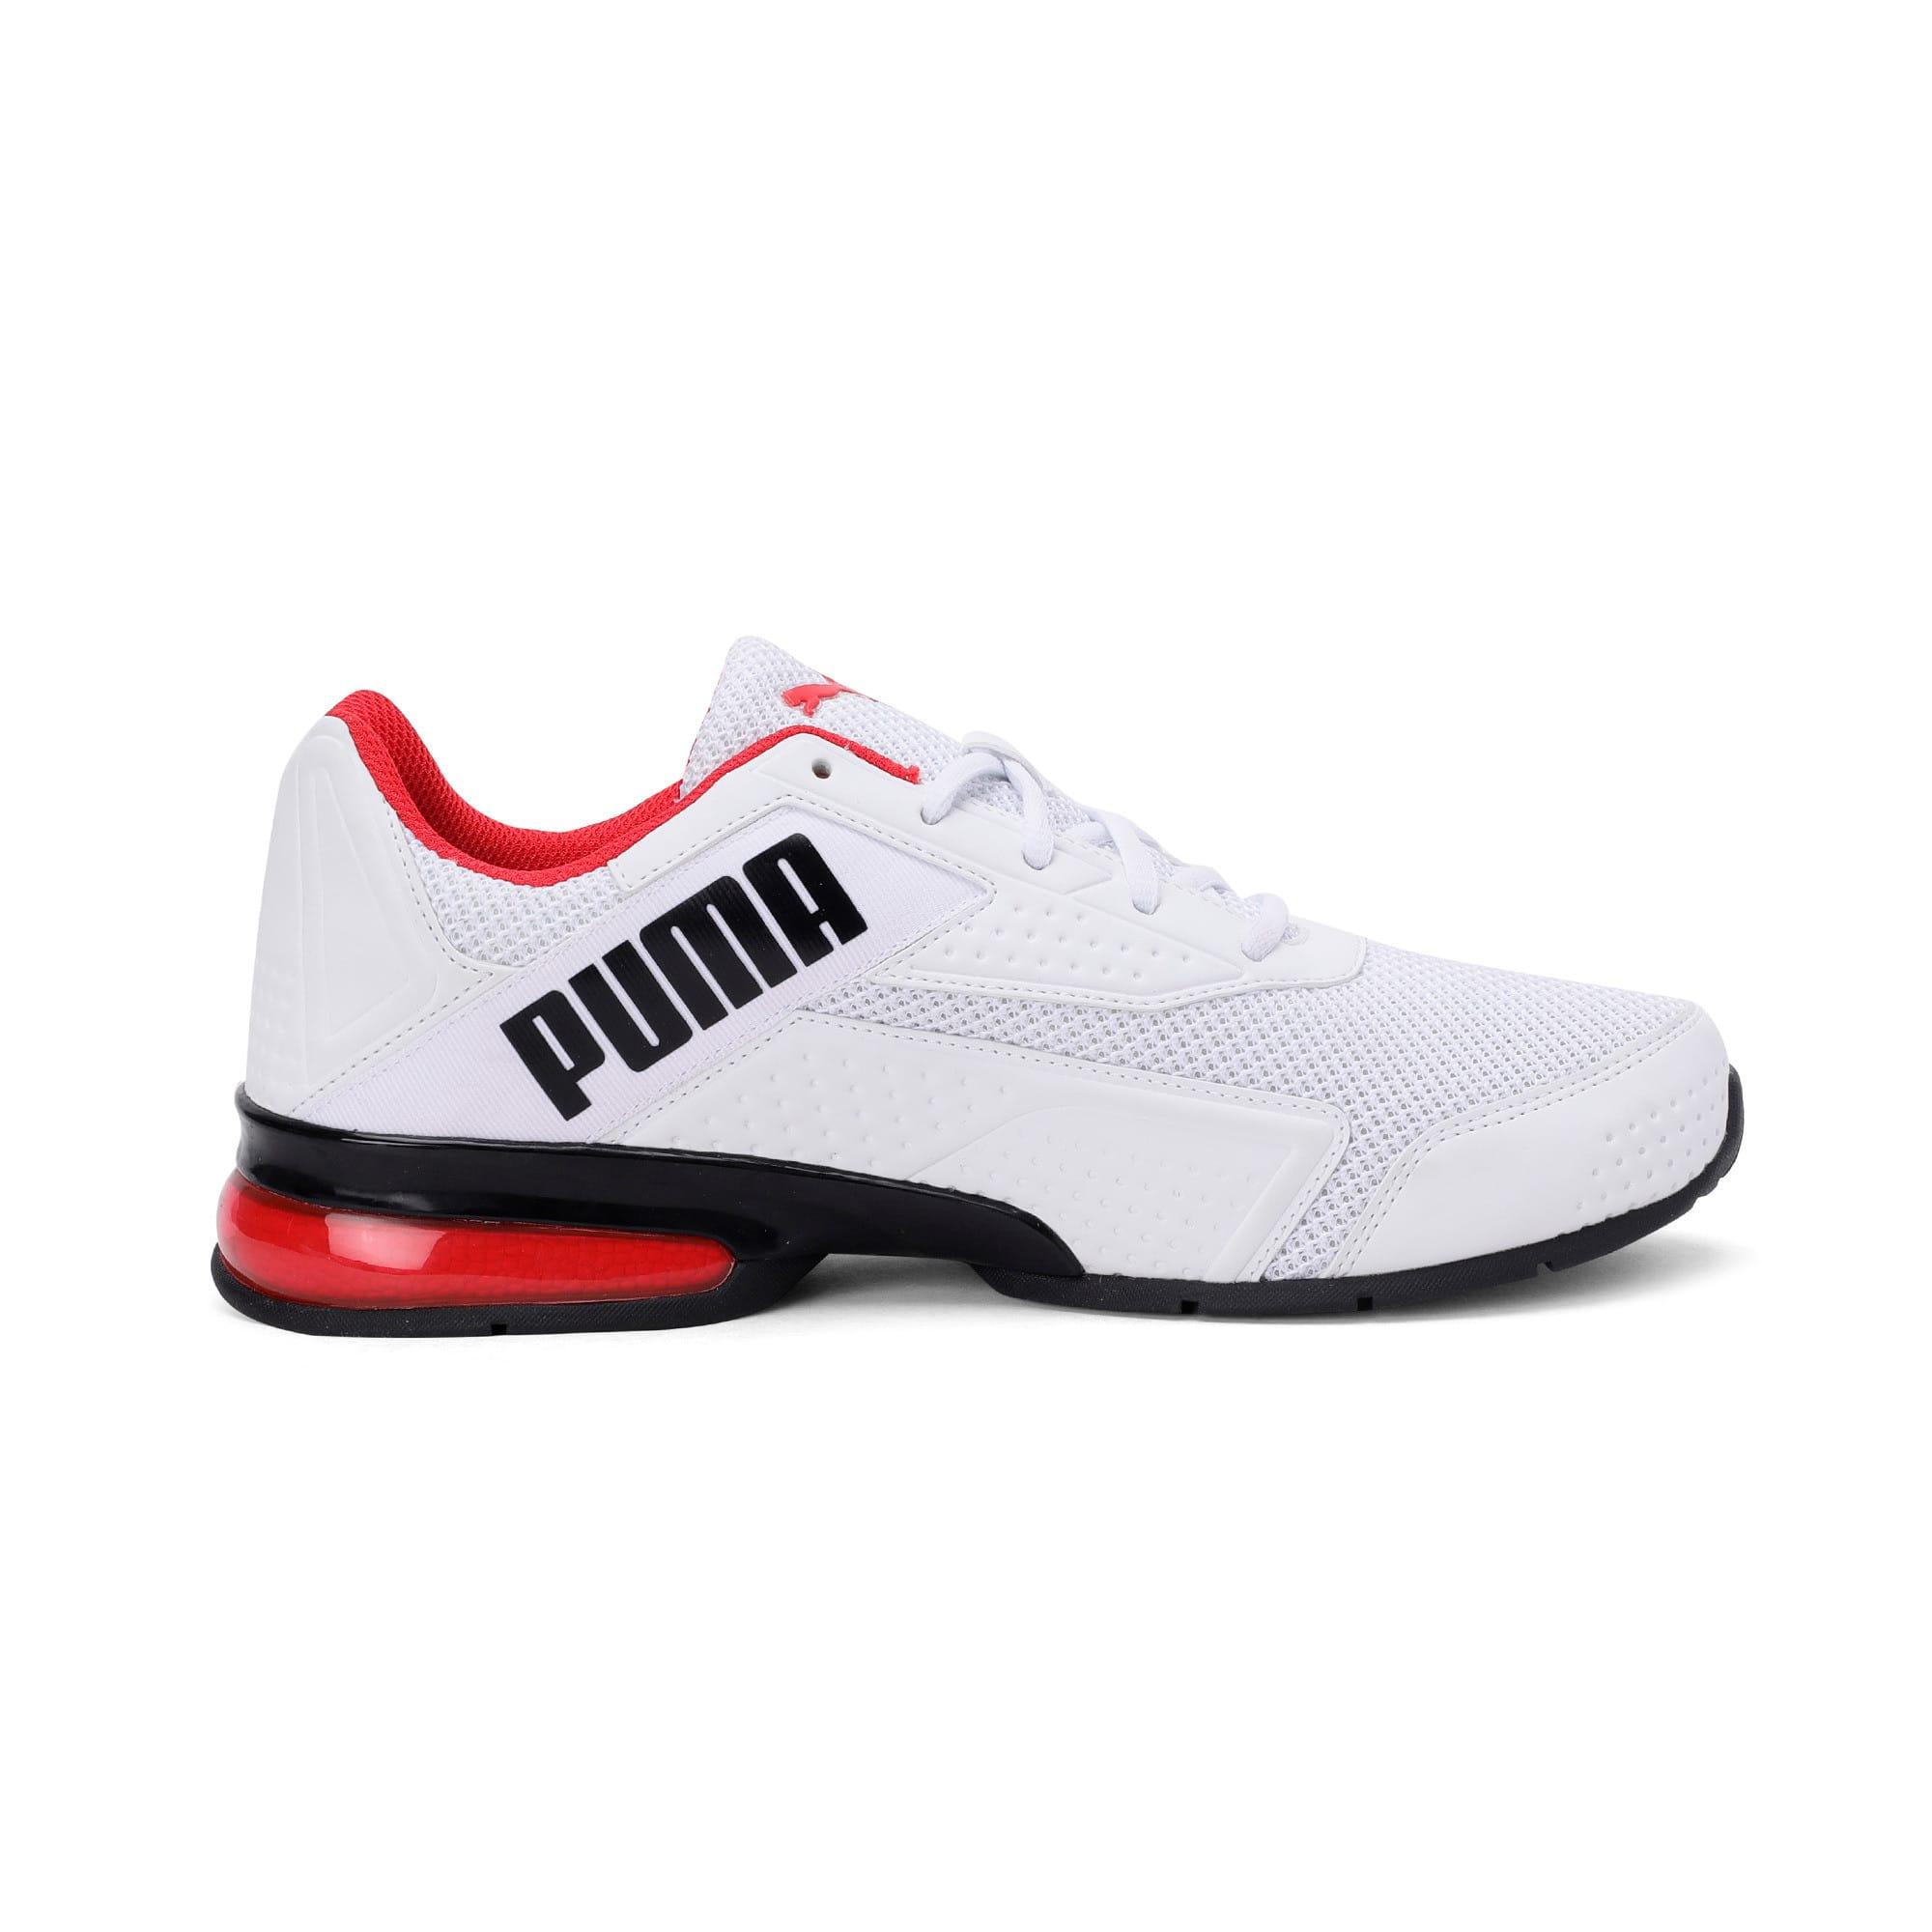 Thumbnail 5 of Leader VT NU Training Shoes, Puma Wht-Hgh Rsk Rd-Pma Blk, medium-IND